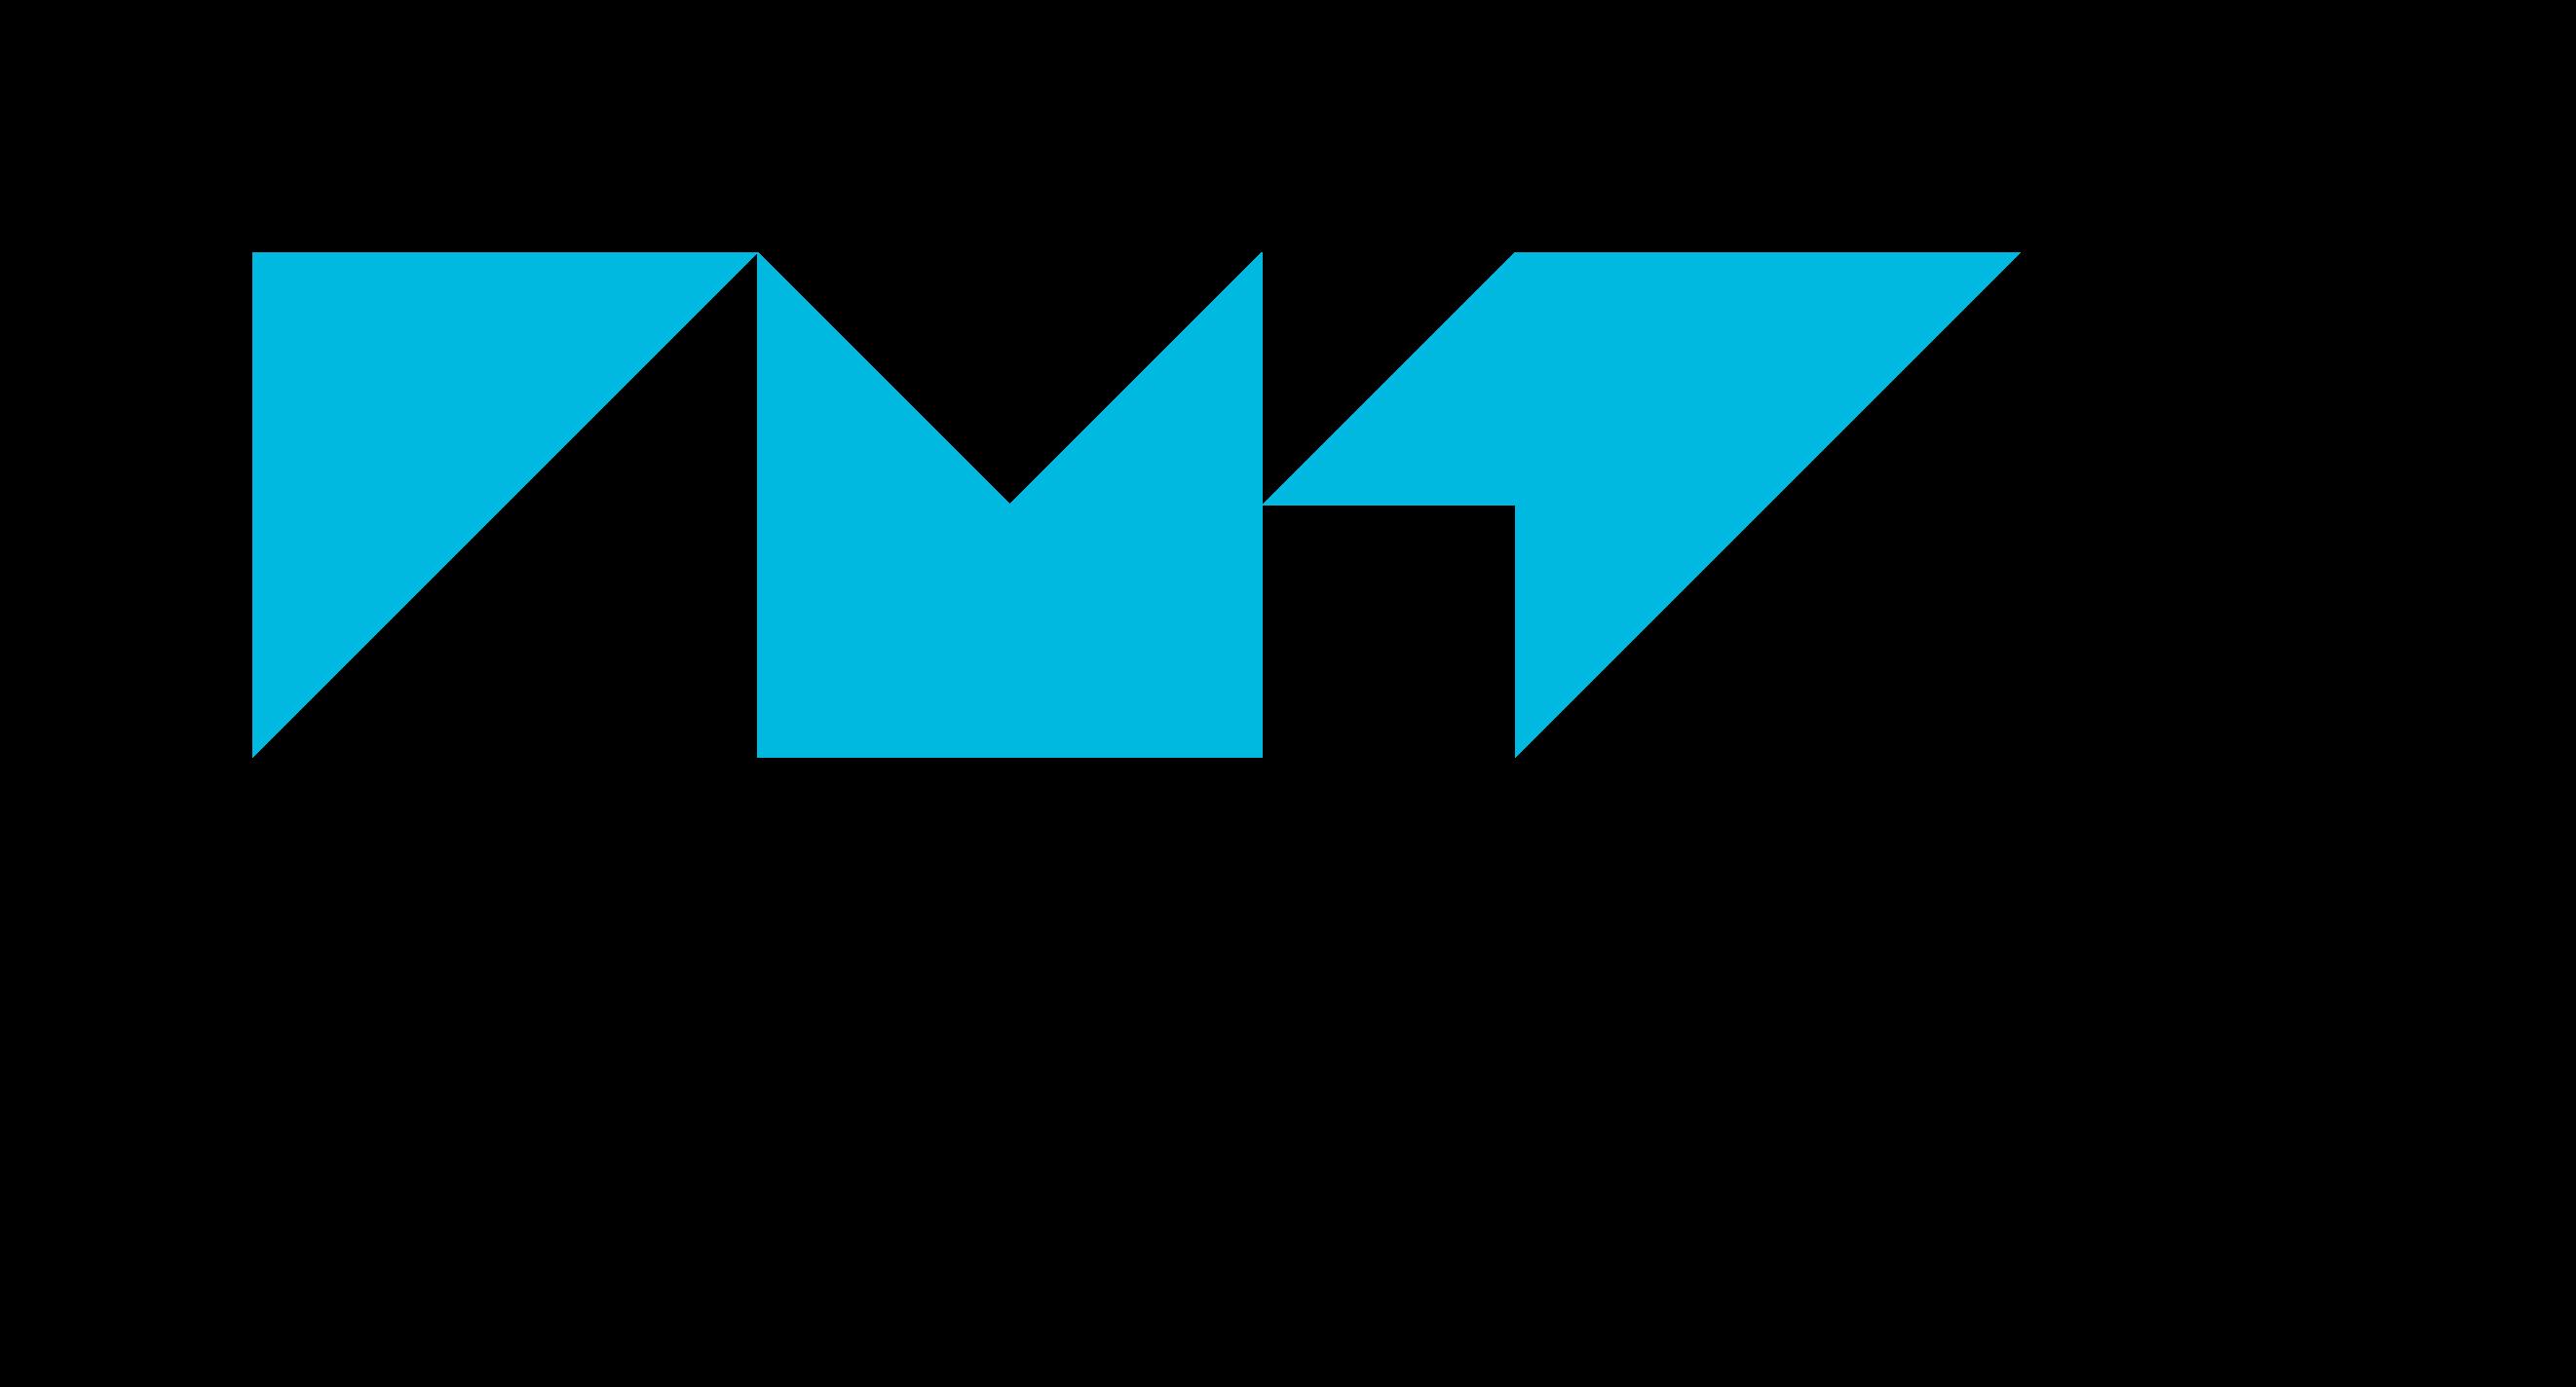 Logo IMT Mines Albi